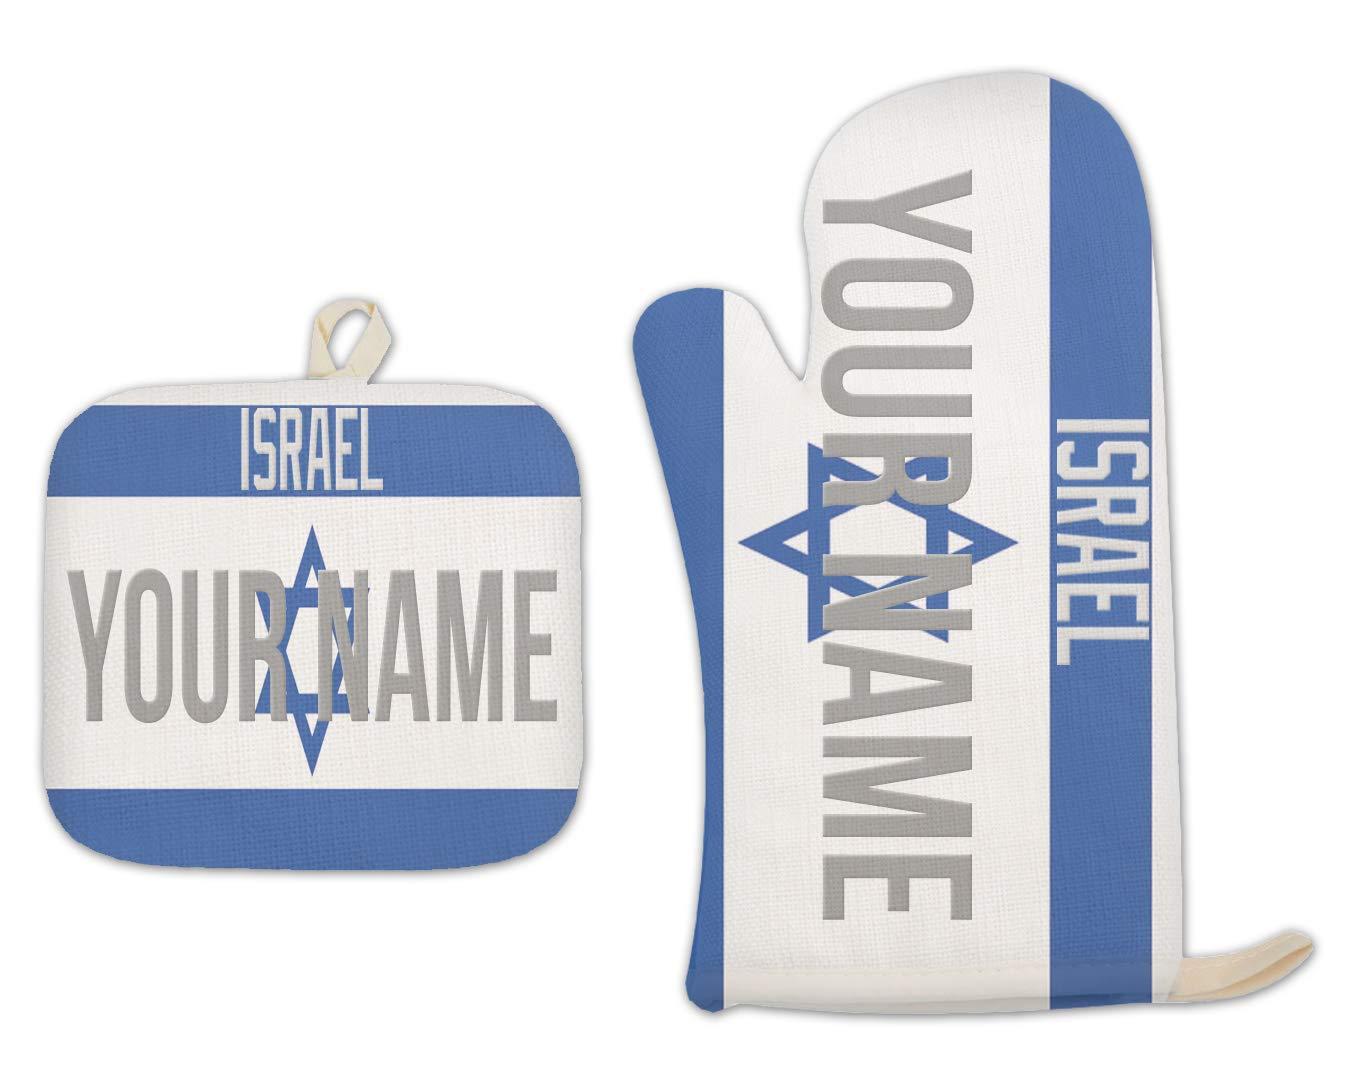 Bleu Reign BRGiftShop Personalized Custom Name License Israel Flag Country Plate Linen Oven Mitt and Potholder Set